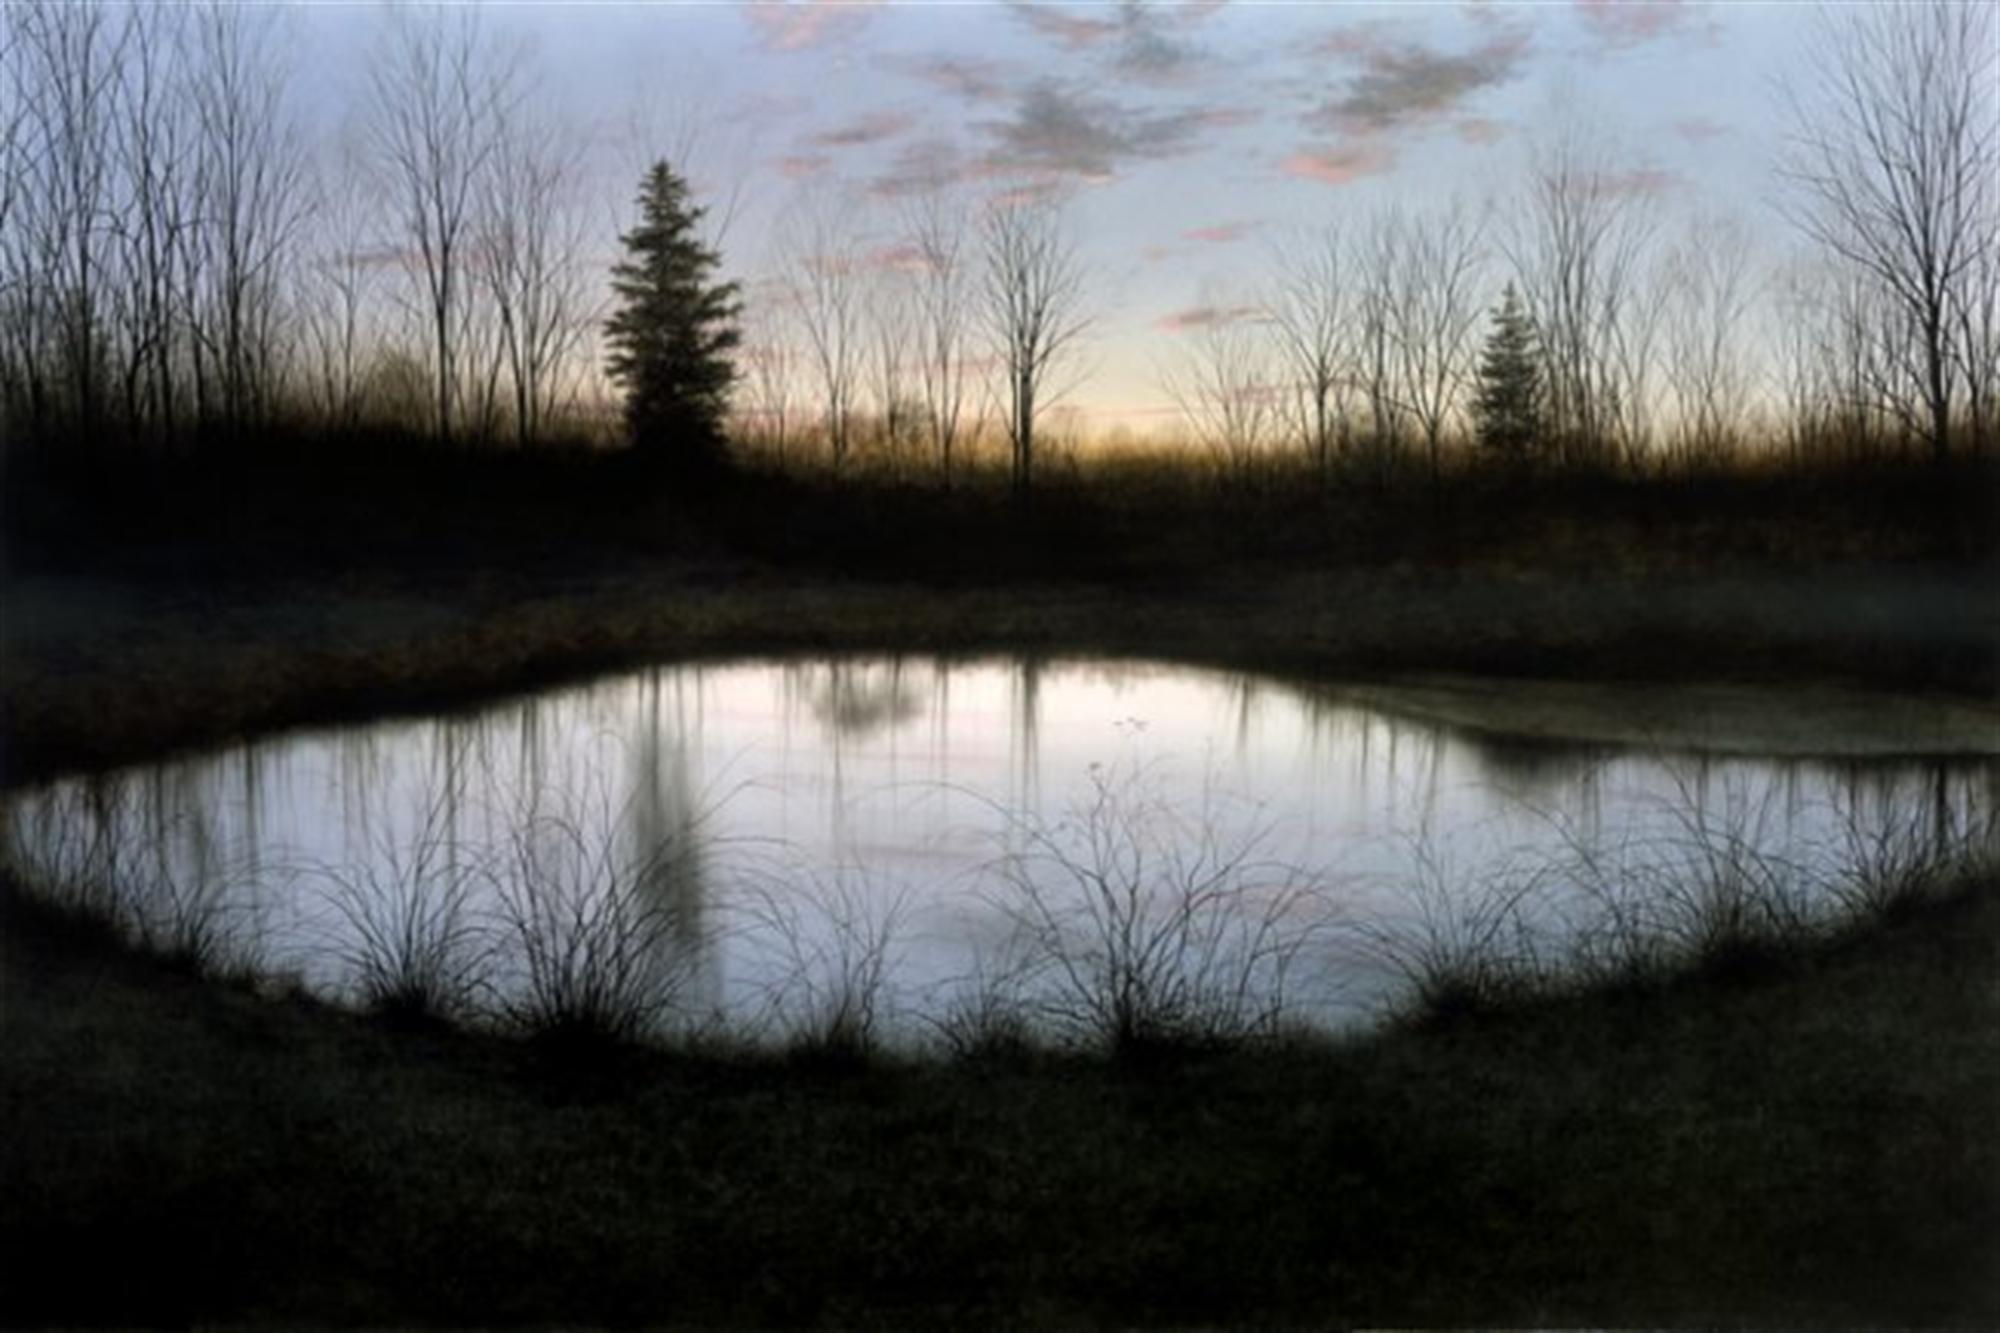 Night Pond by Alexander Volkov